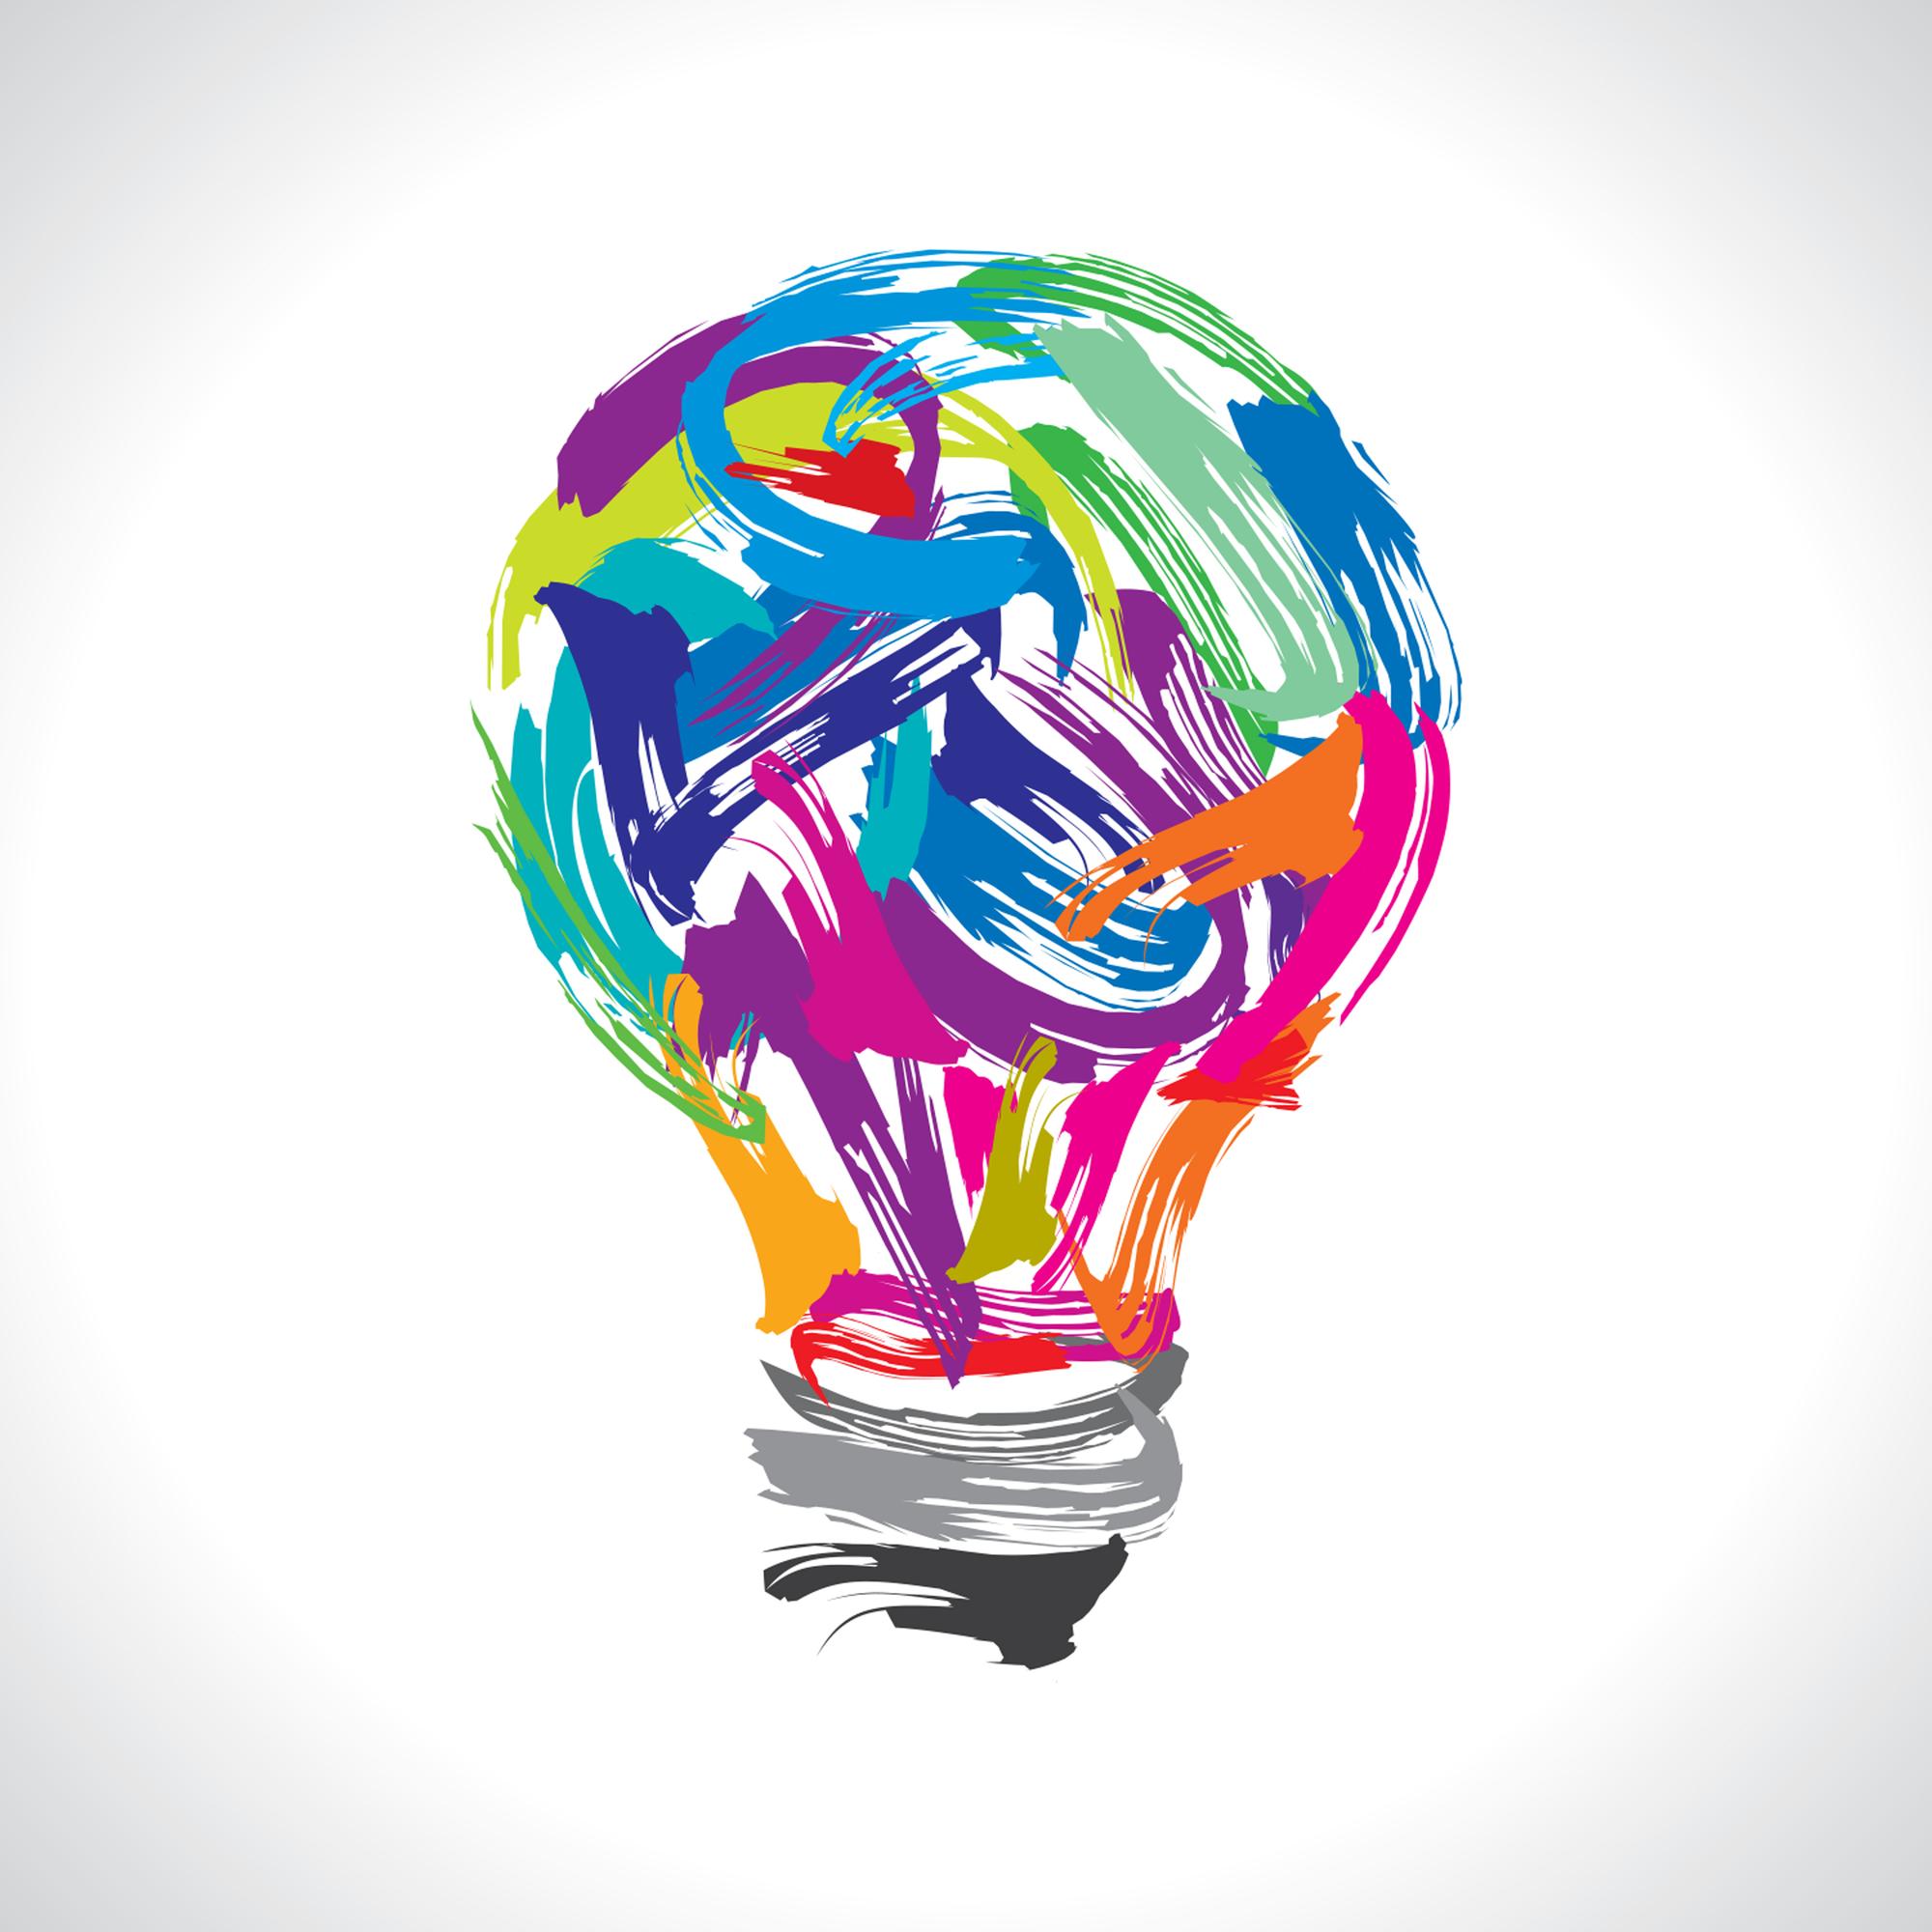 Empreendedorismo Social com foco no Autismo (ESA) — Revista Autismo